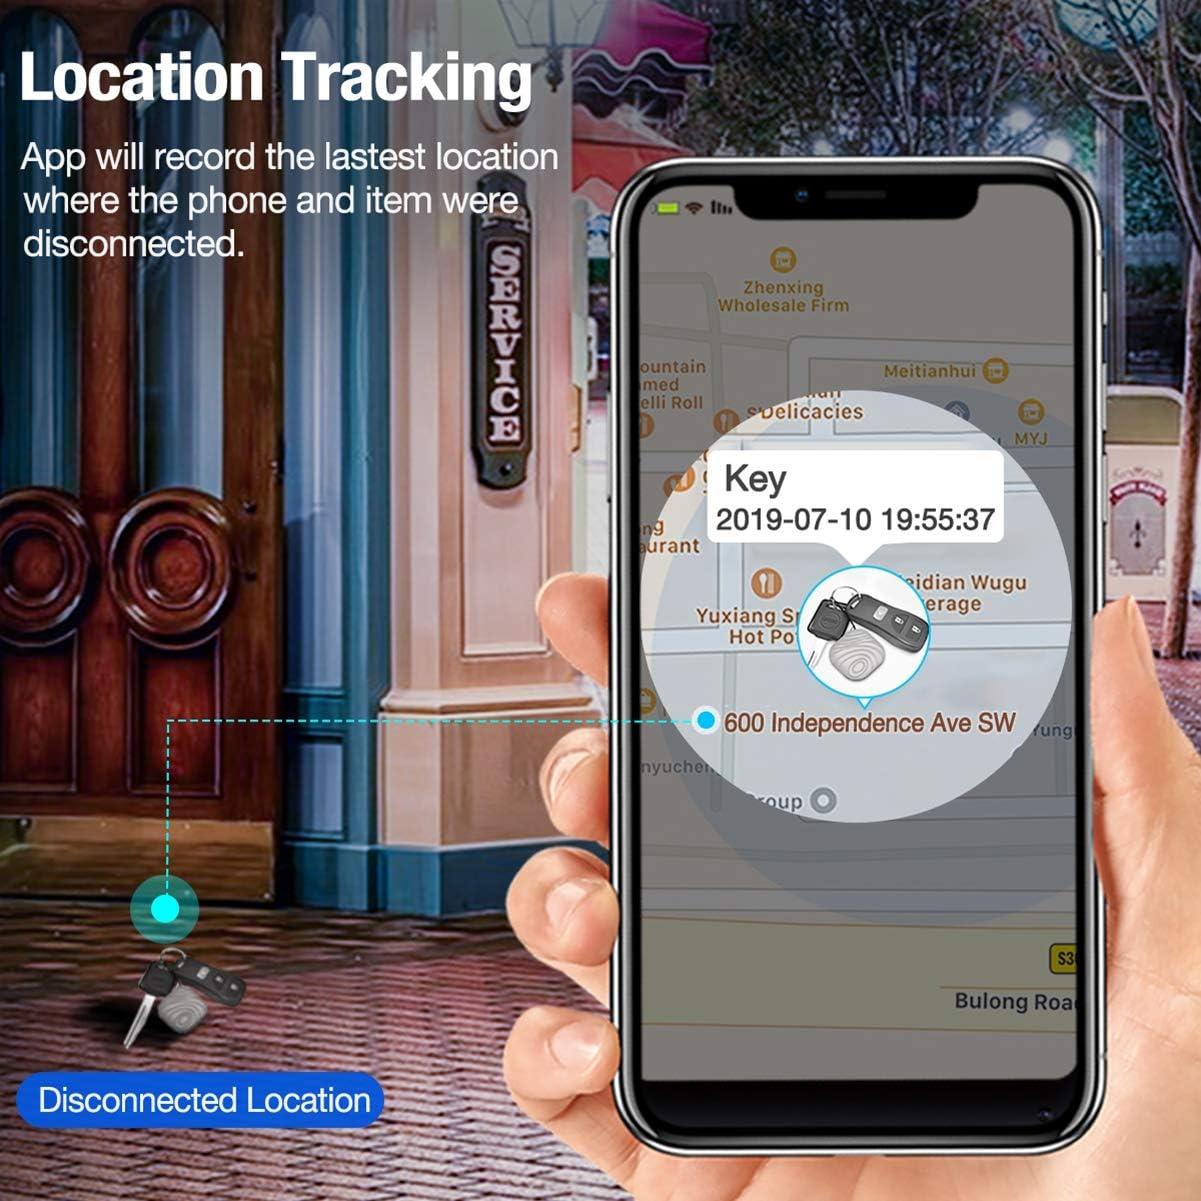 localizador de objetos inal/ámbrico localizador multifuncional de tuerca Buscador de llaves llavero para iOSAndroid funciona con Bluetooth localizador de tel/éfono rastreador de art/ículos cartera